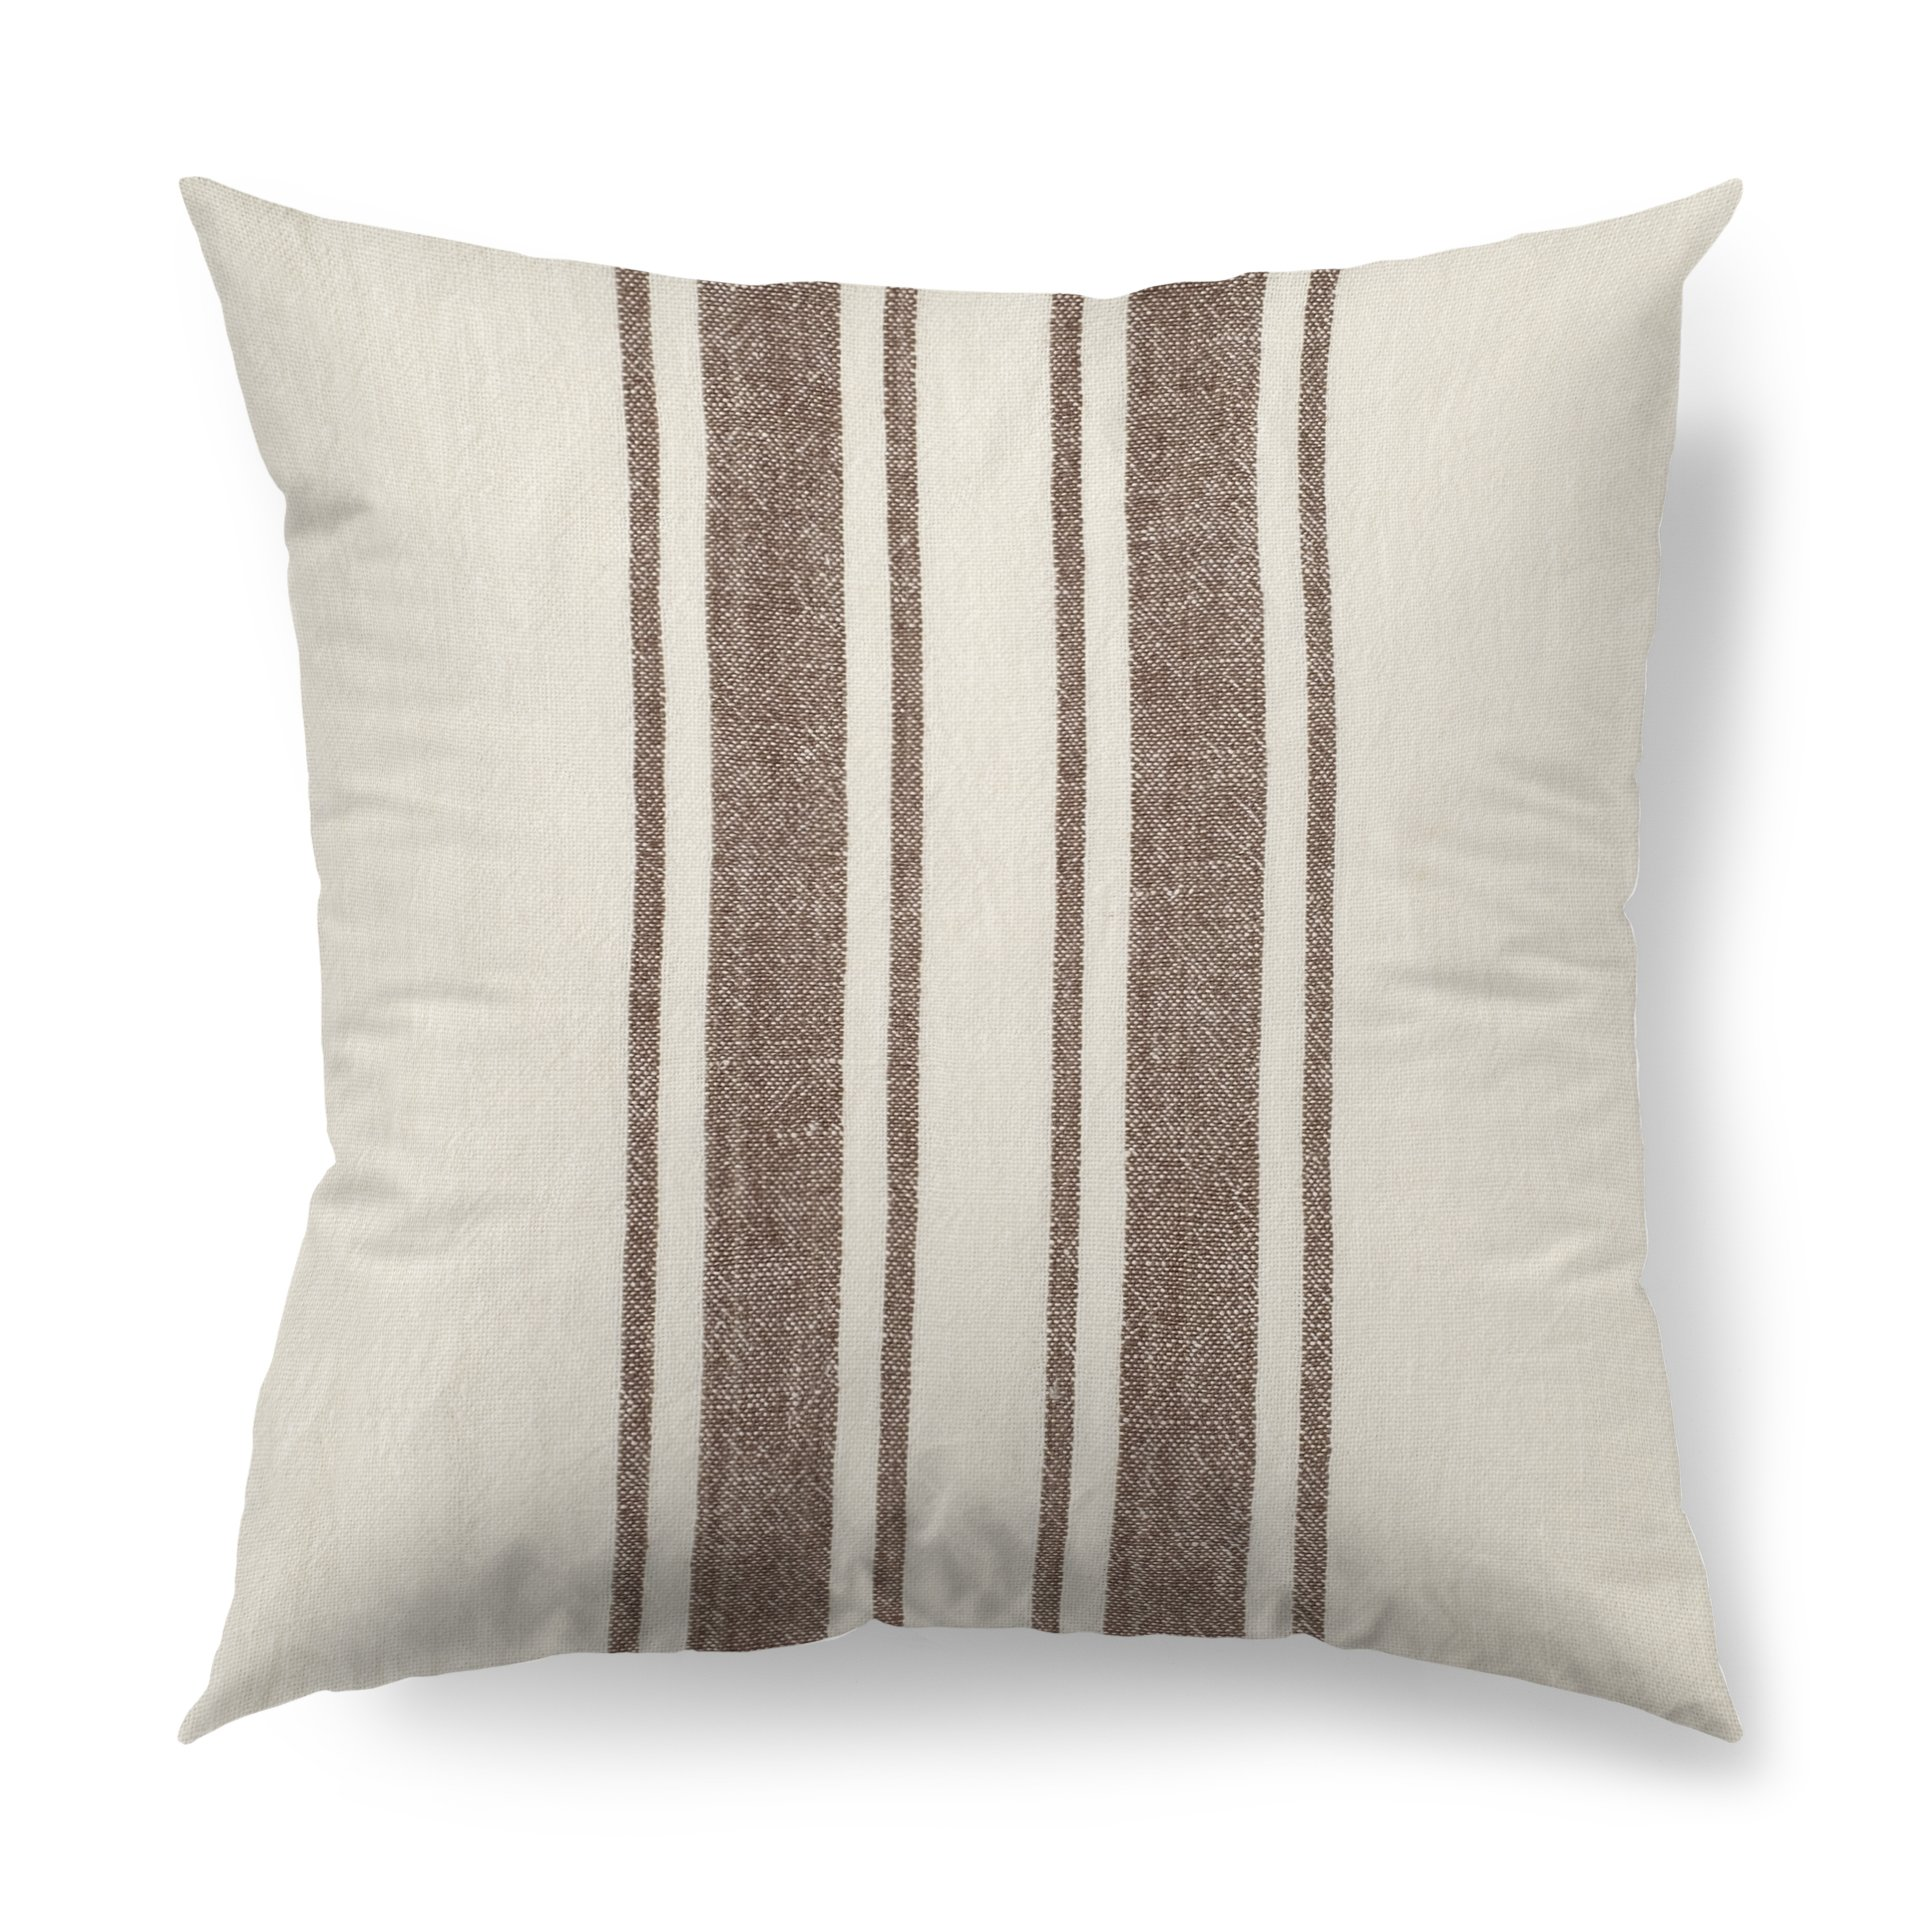 Grayling Pillow